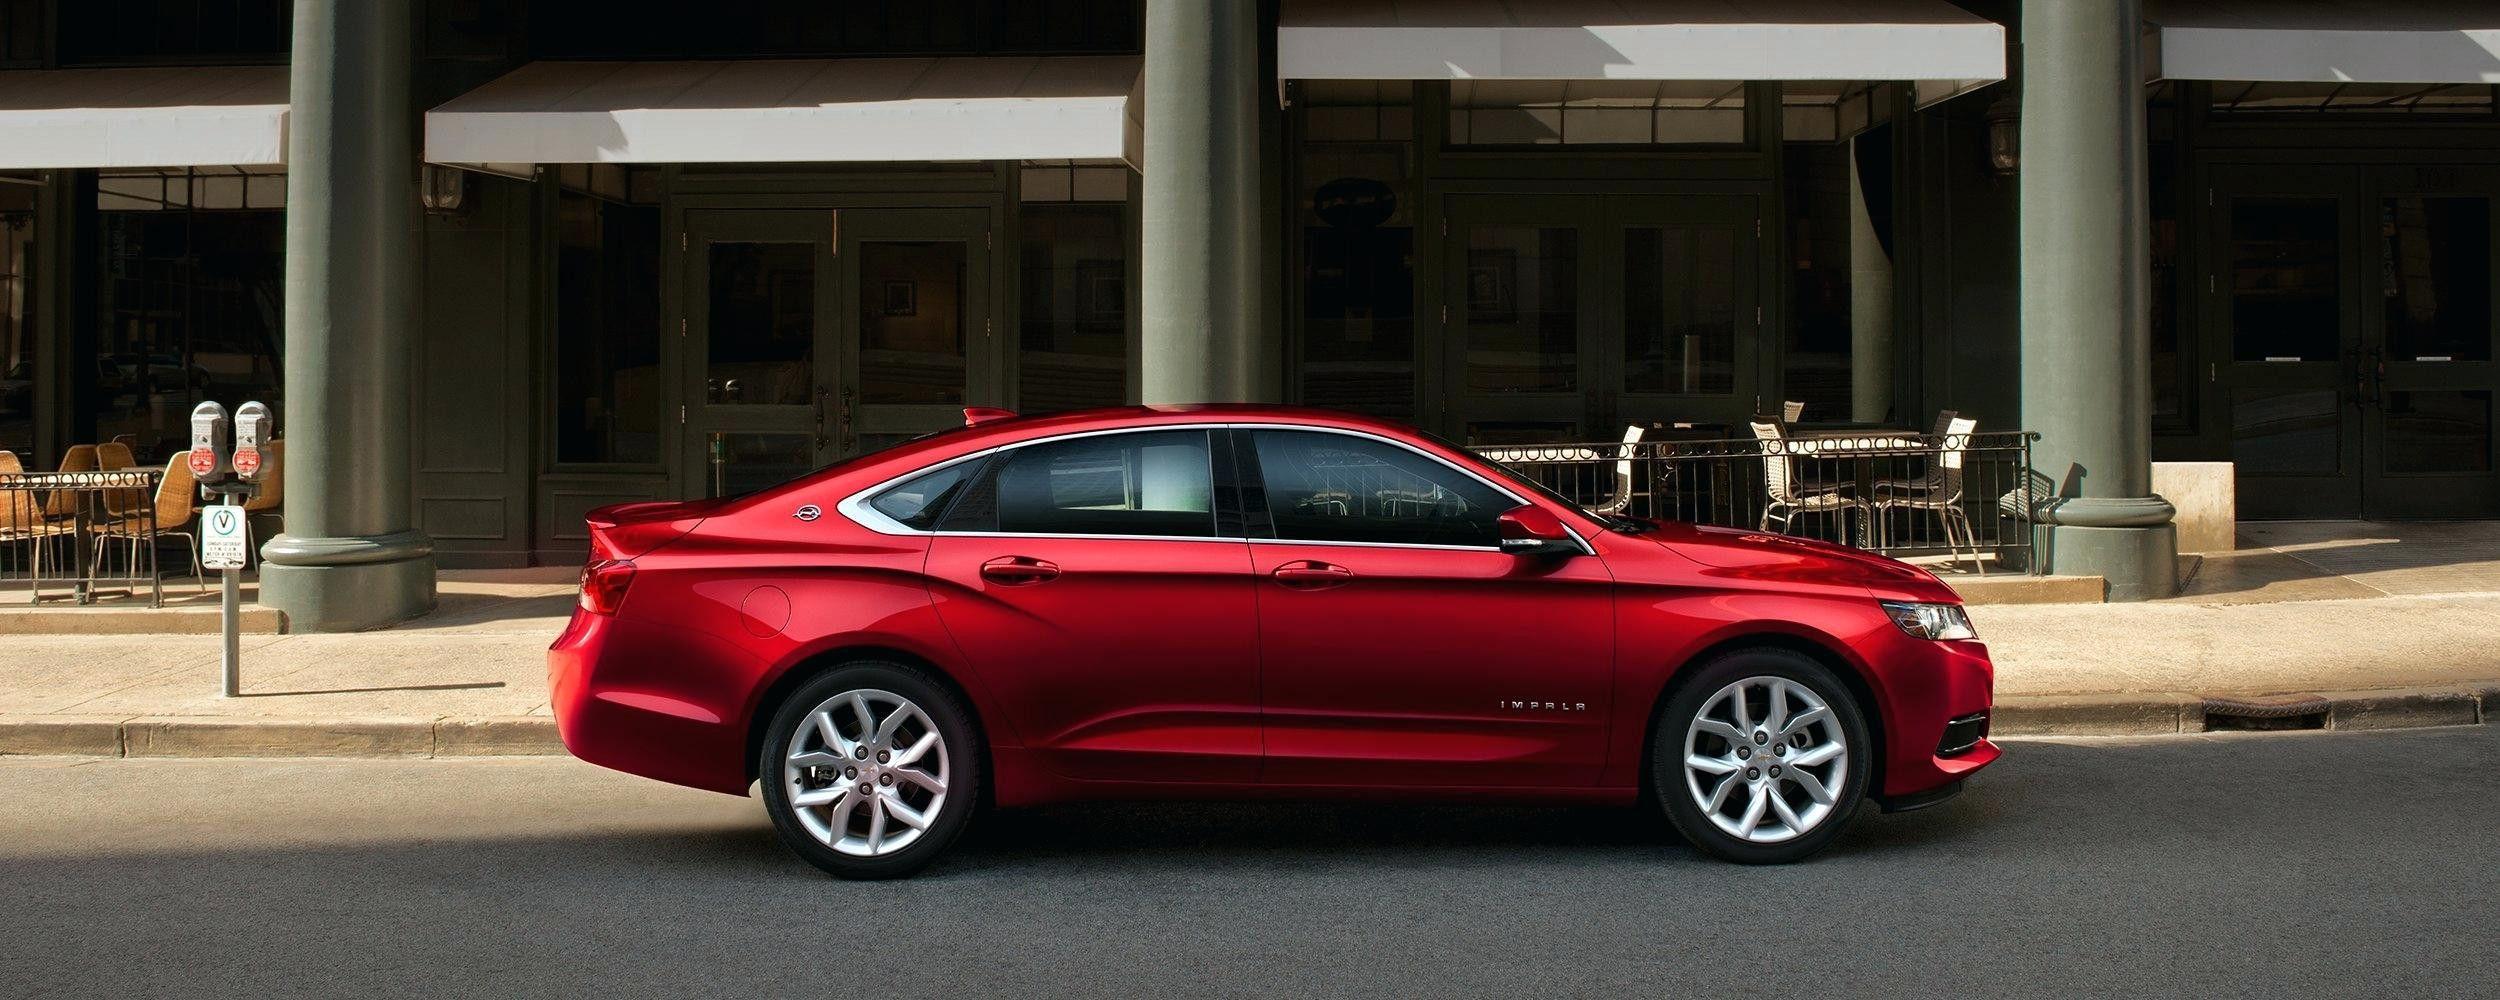 2020 Chevy Impala Ss Ltz Coupe Release